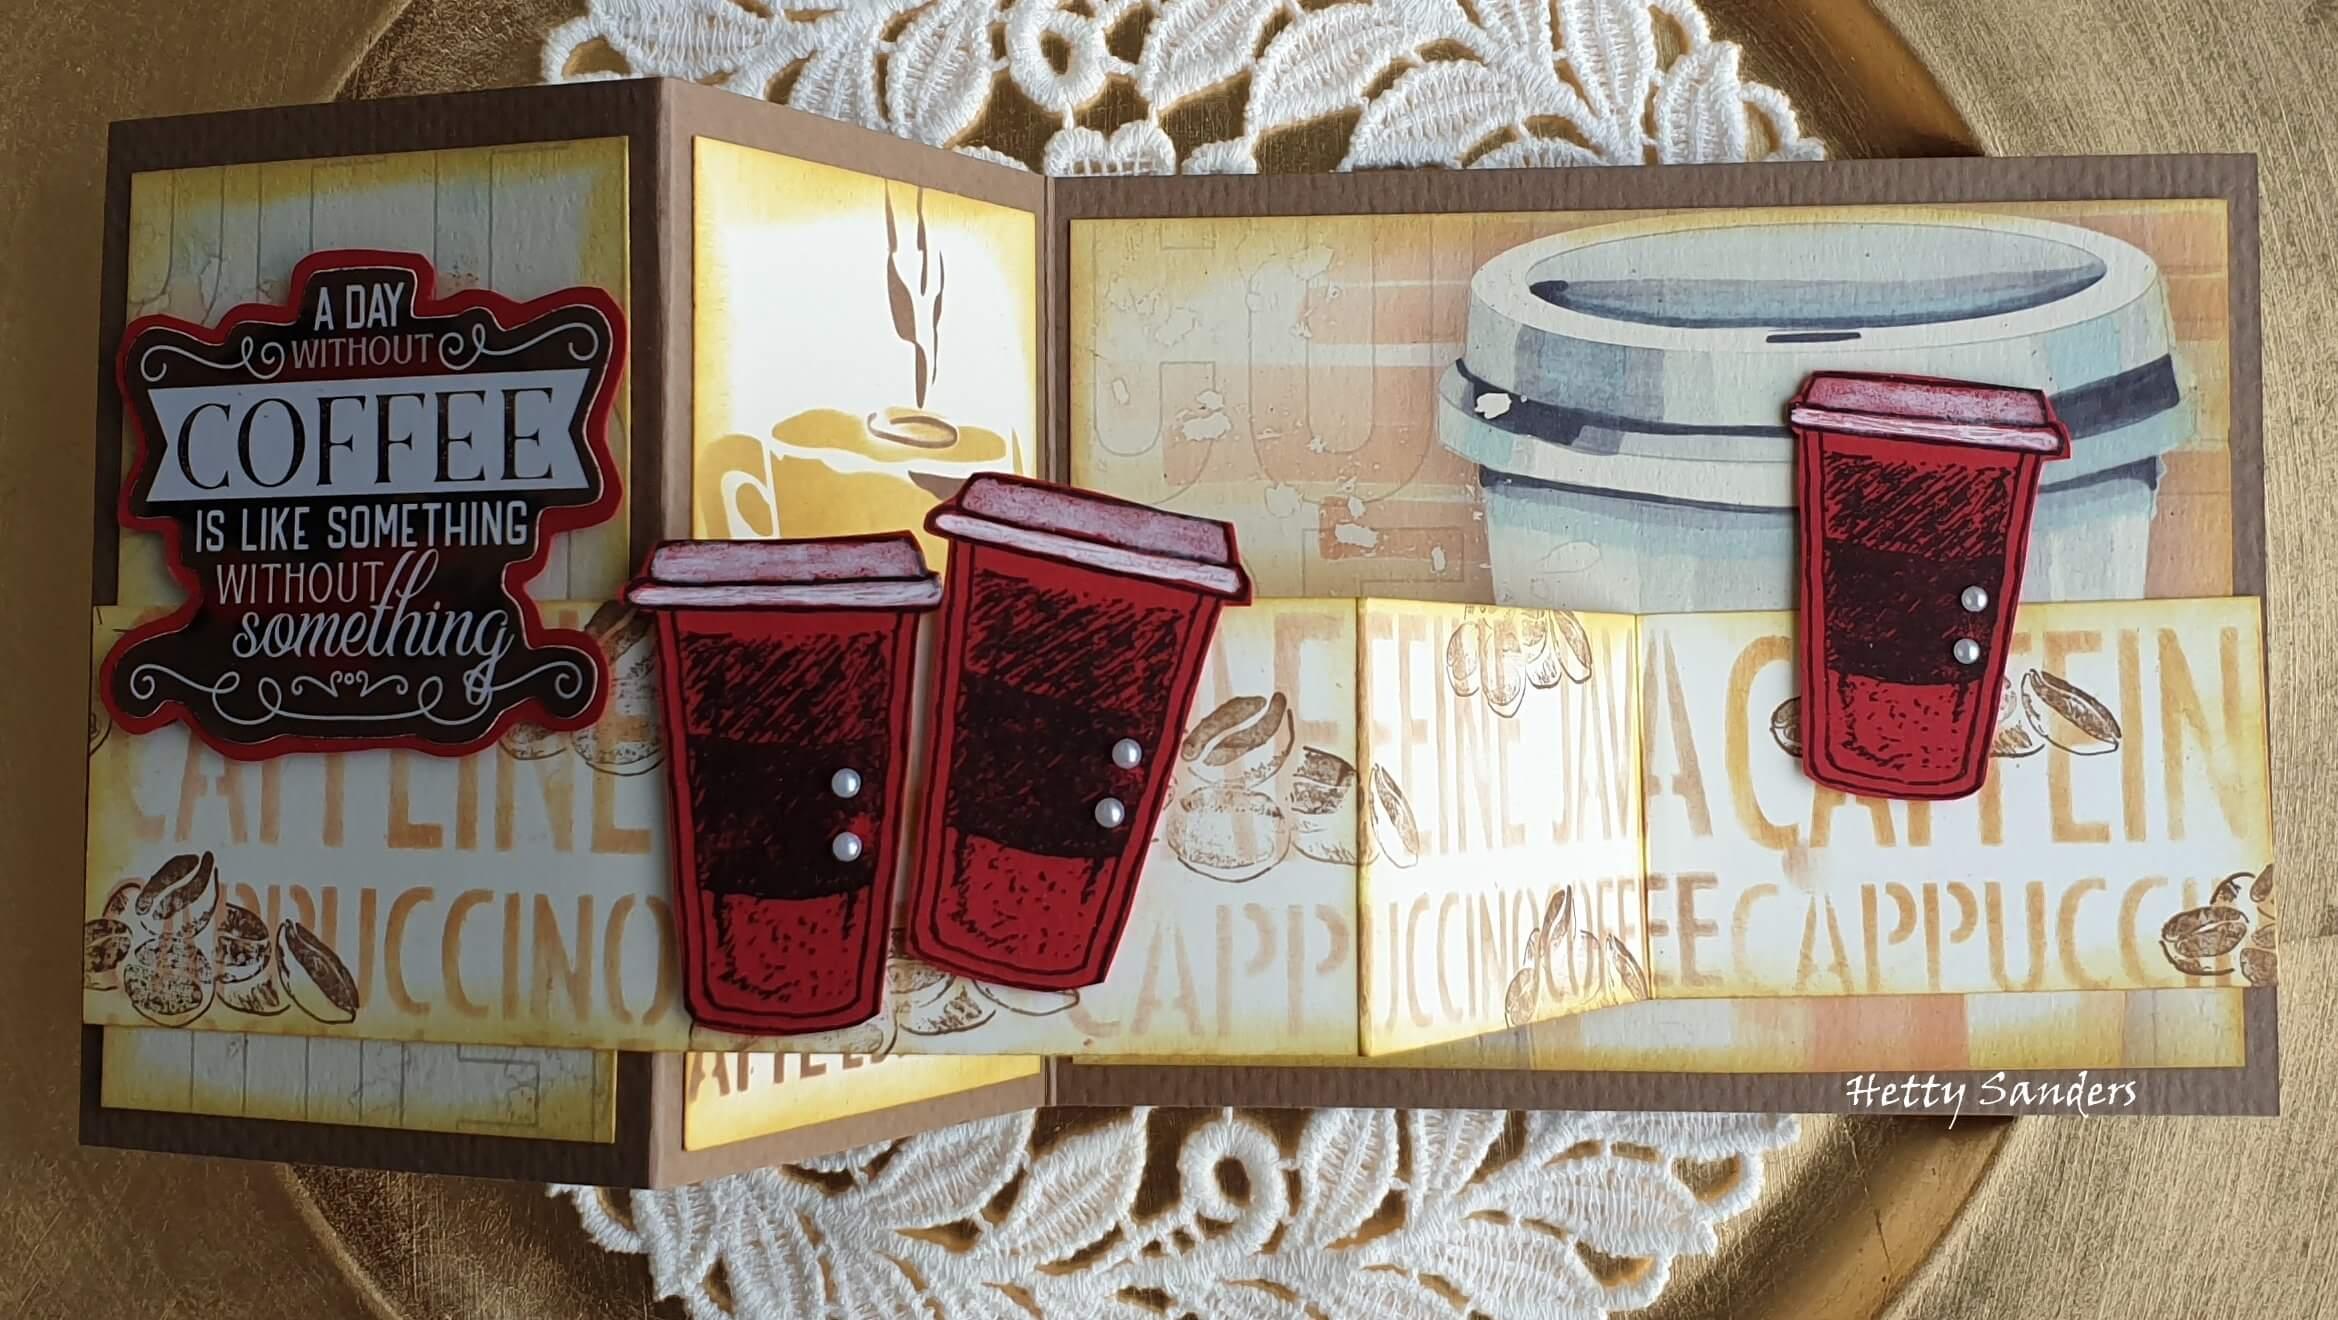 Coffee Christmas Cards by Hetty Sanders